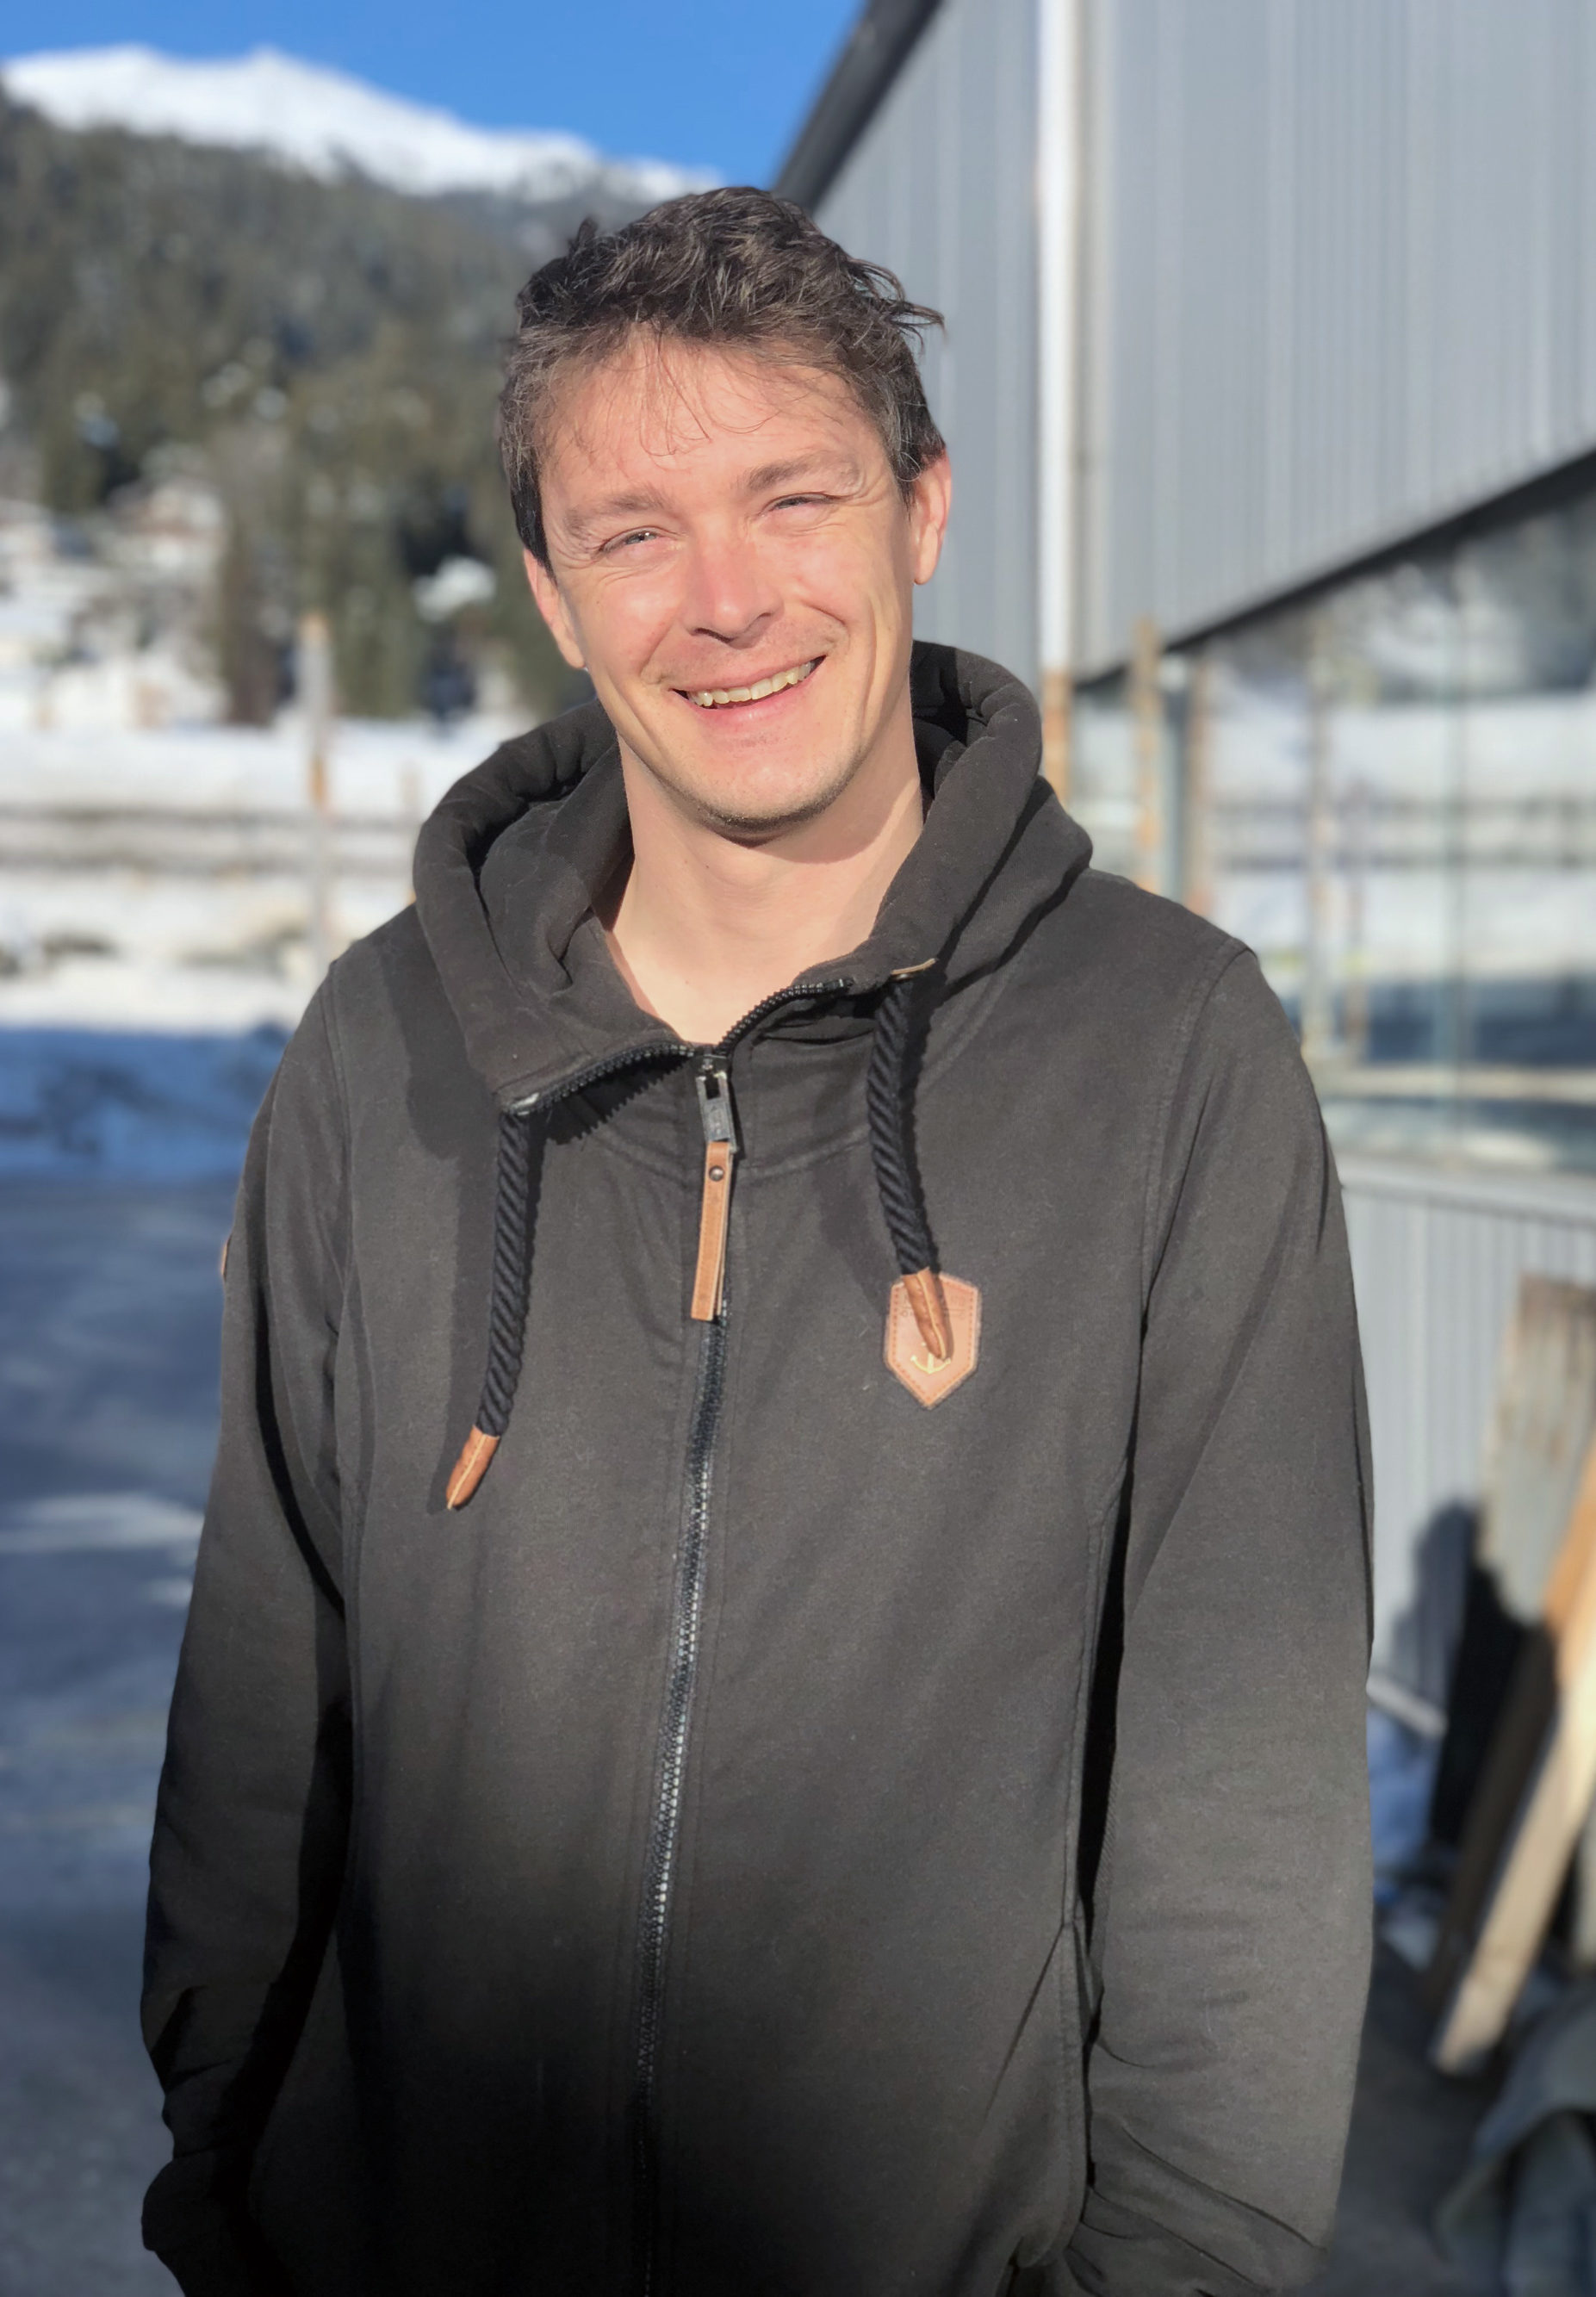 Arno Niederberger